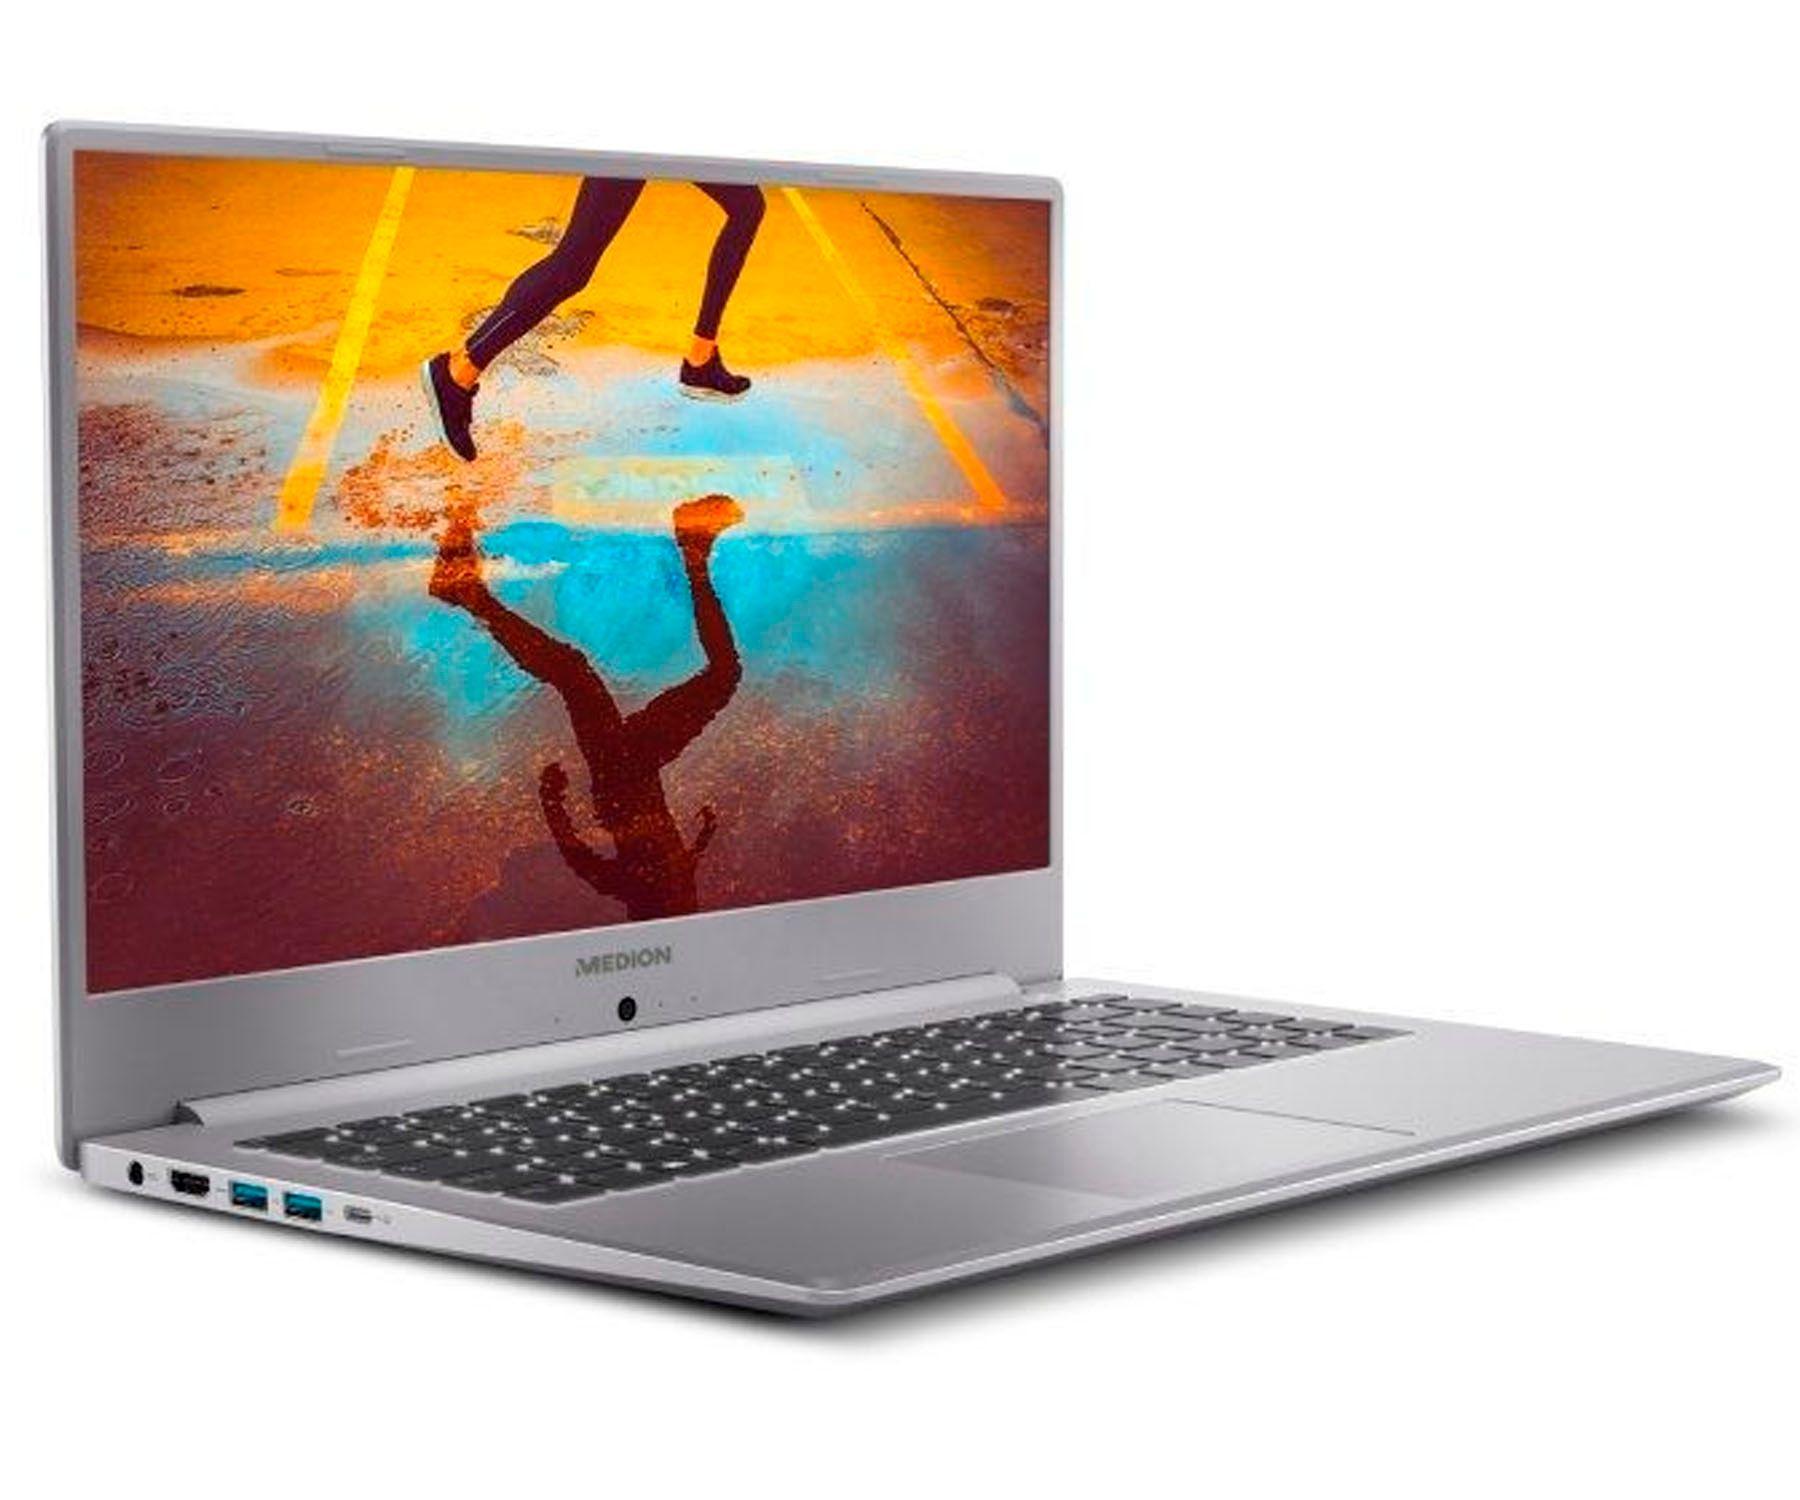 Portátil Medion Akoya S15449 Intel Core i5-1135G7/ 8GB/ 512GB SSD/ 15.6'/ Win10